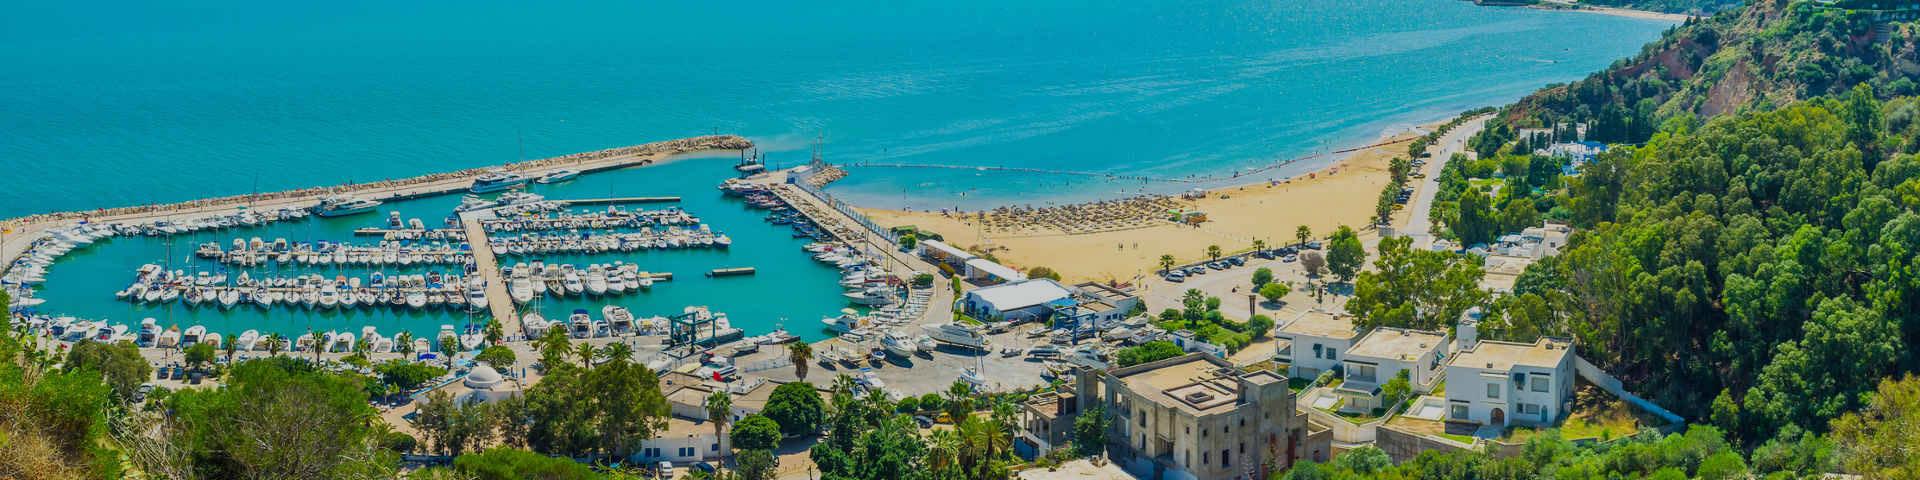 Tunis hero edit